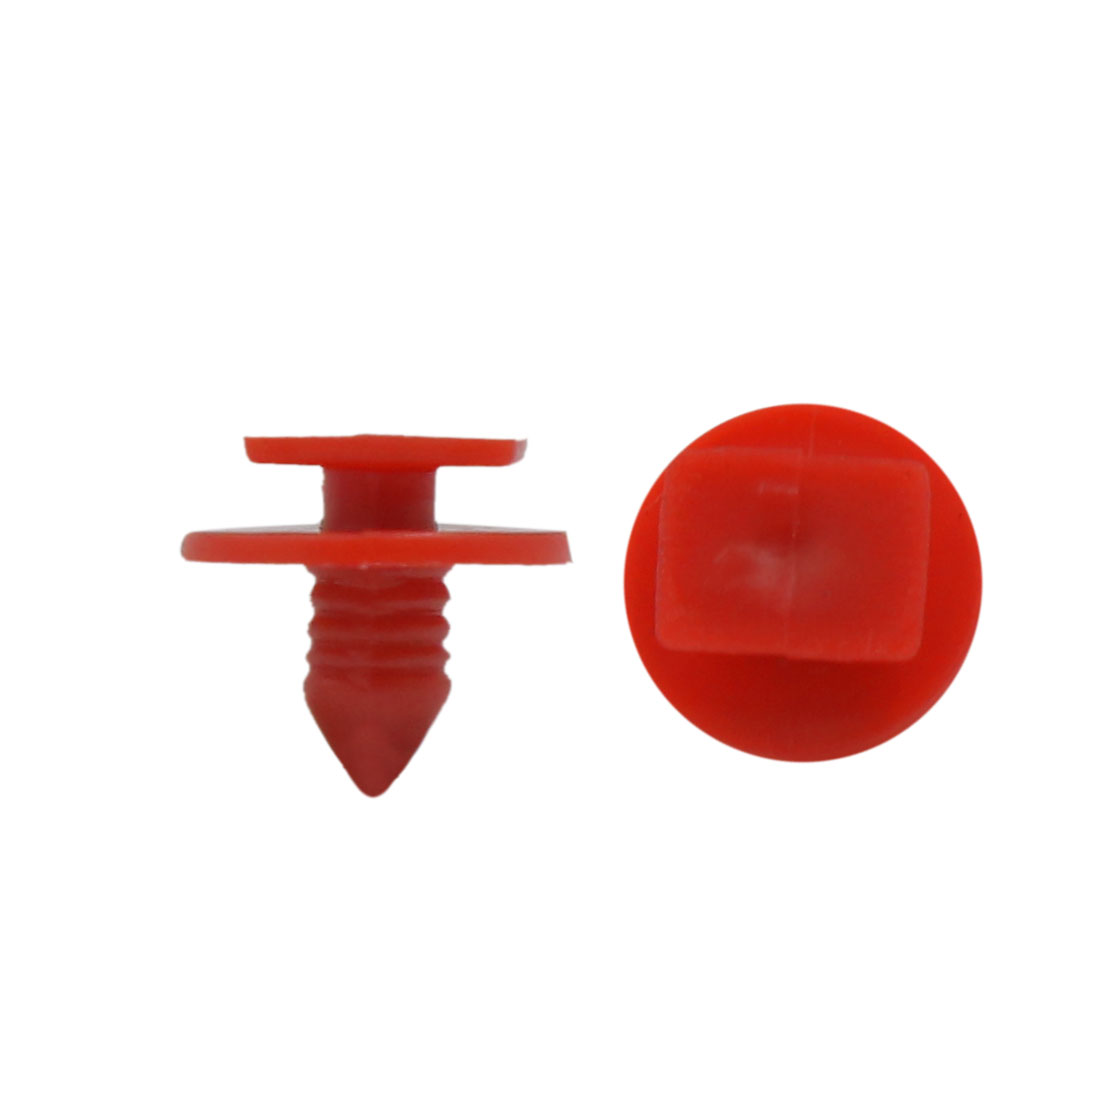 20 Pcs Red 6mm Dia Hole Plastic Push-Type Bumper Retainer Rivet Clips for Car